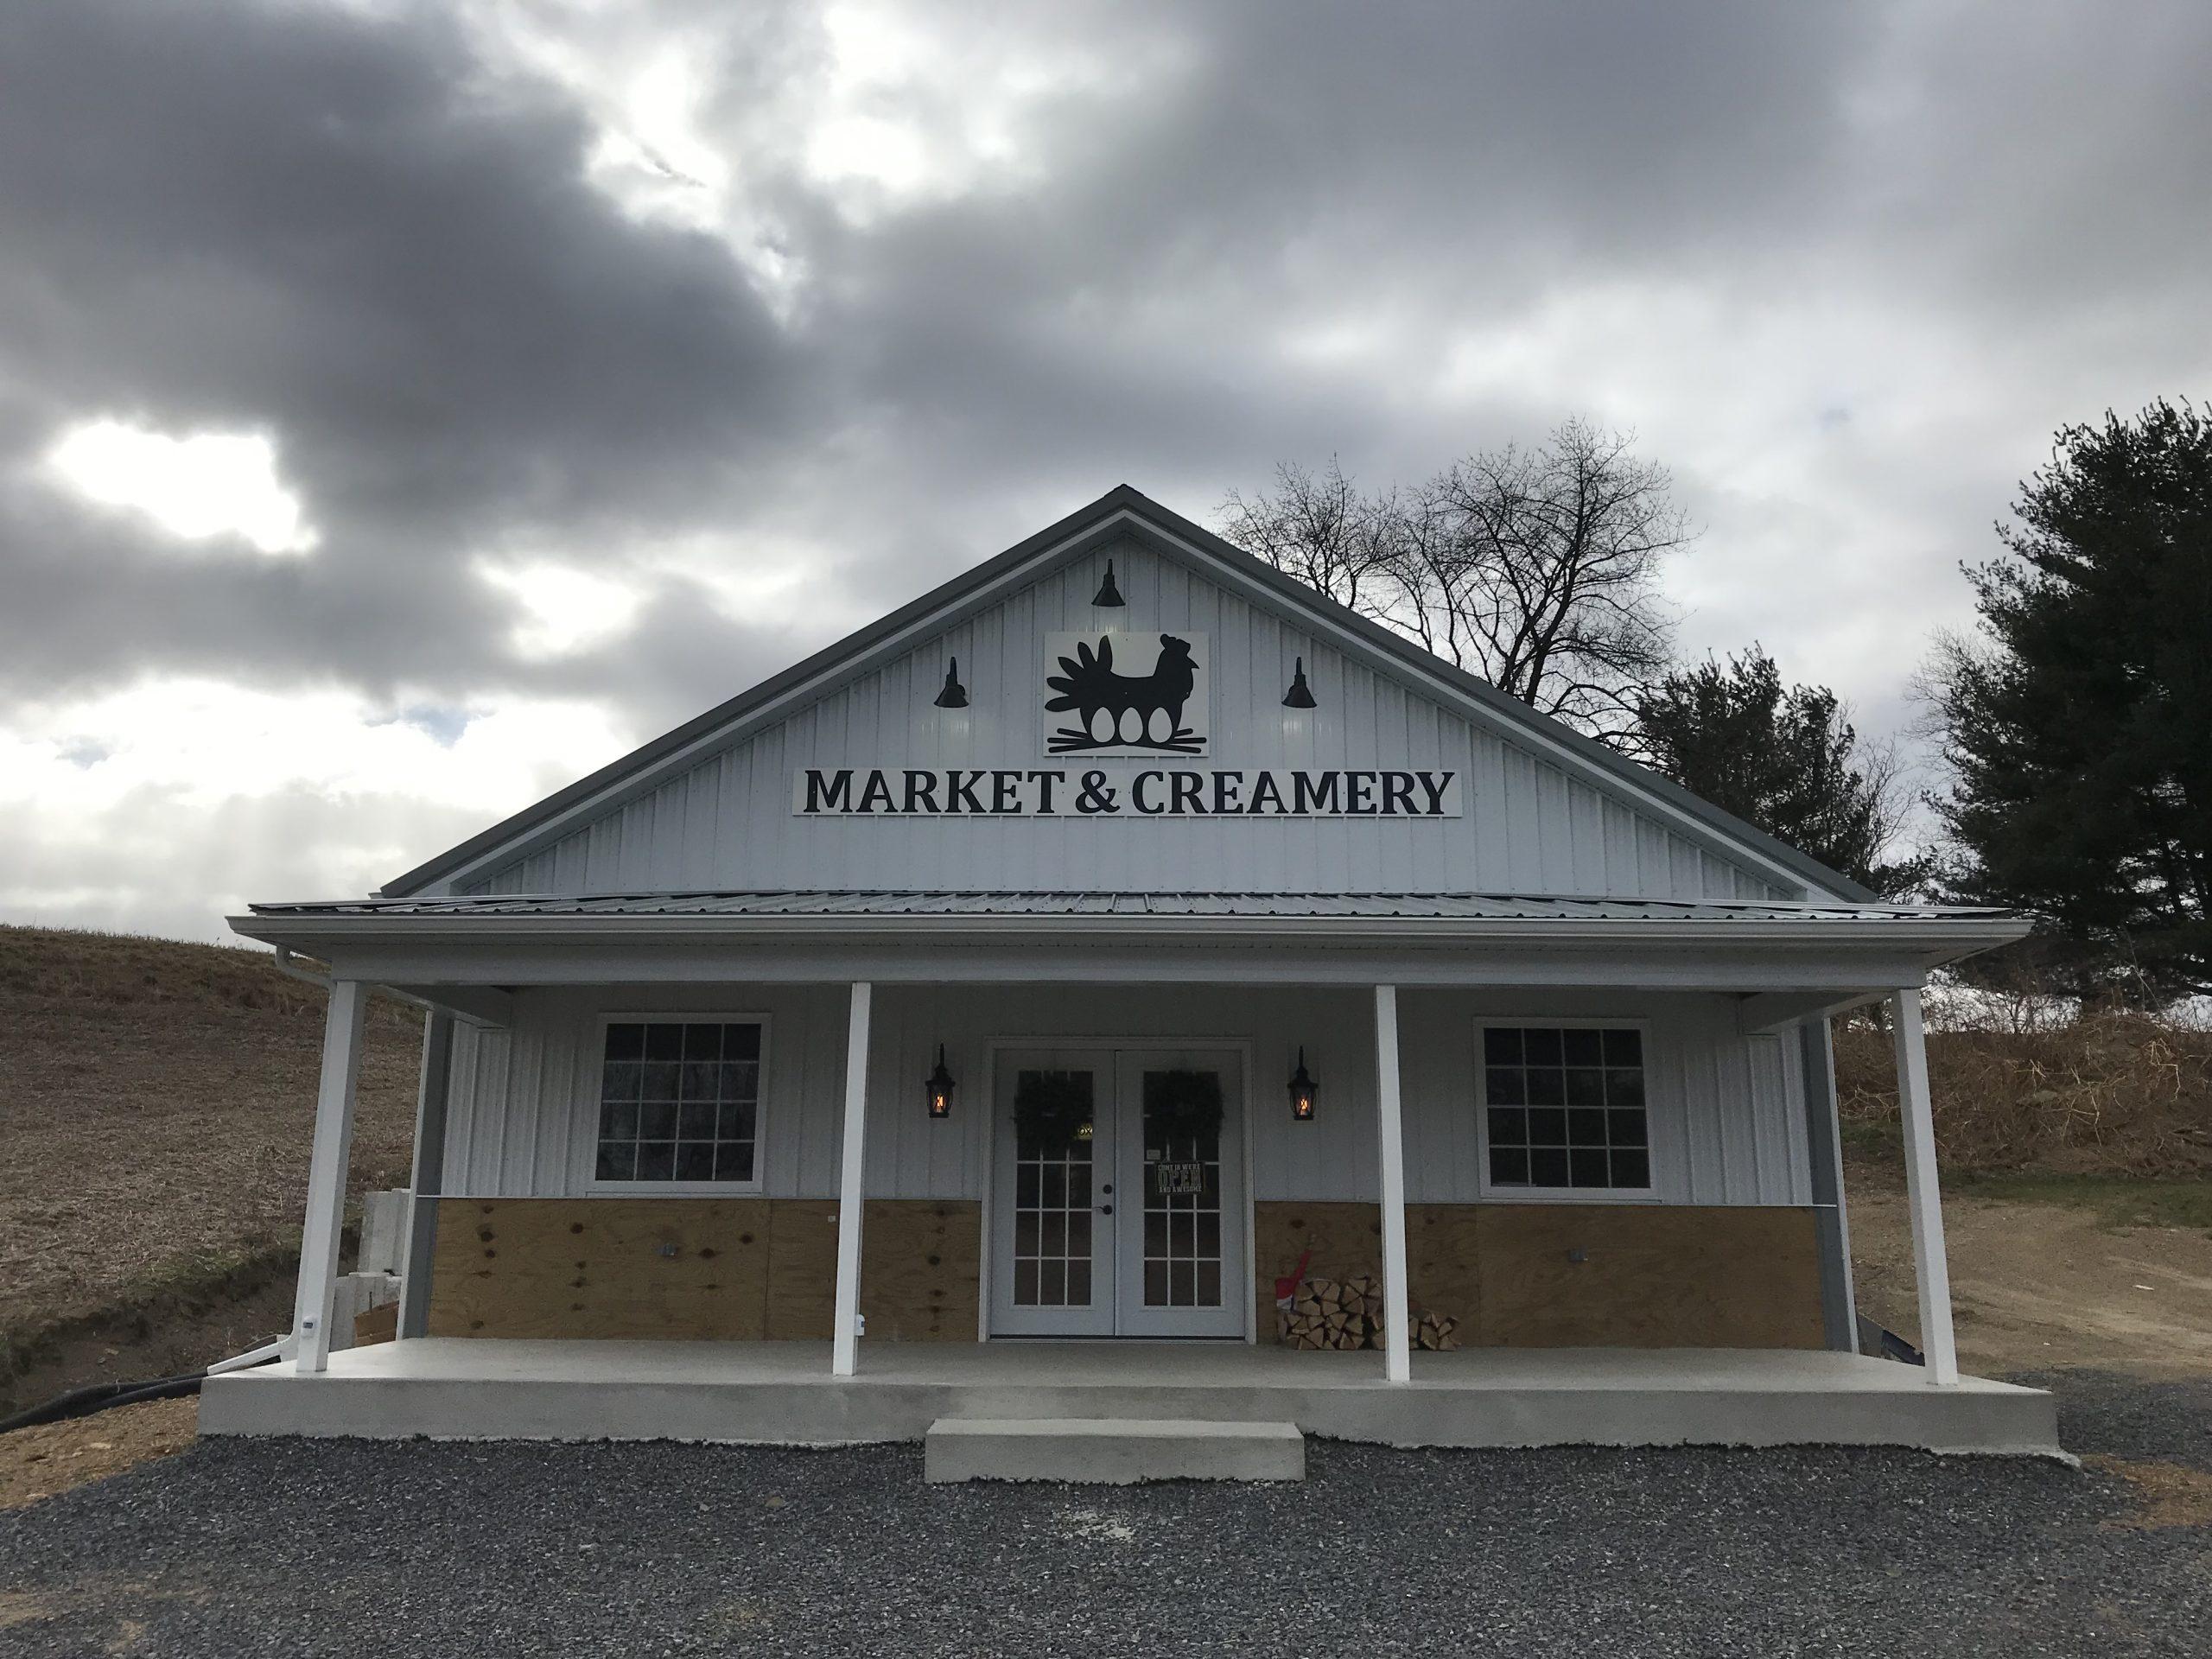 Kempton, PA Primary Image